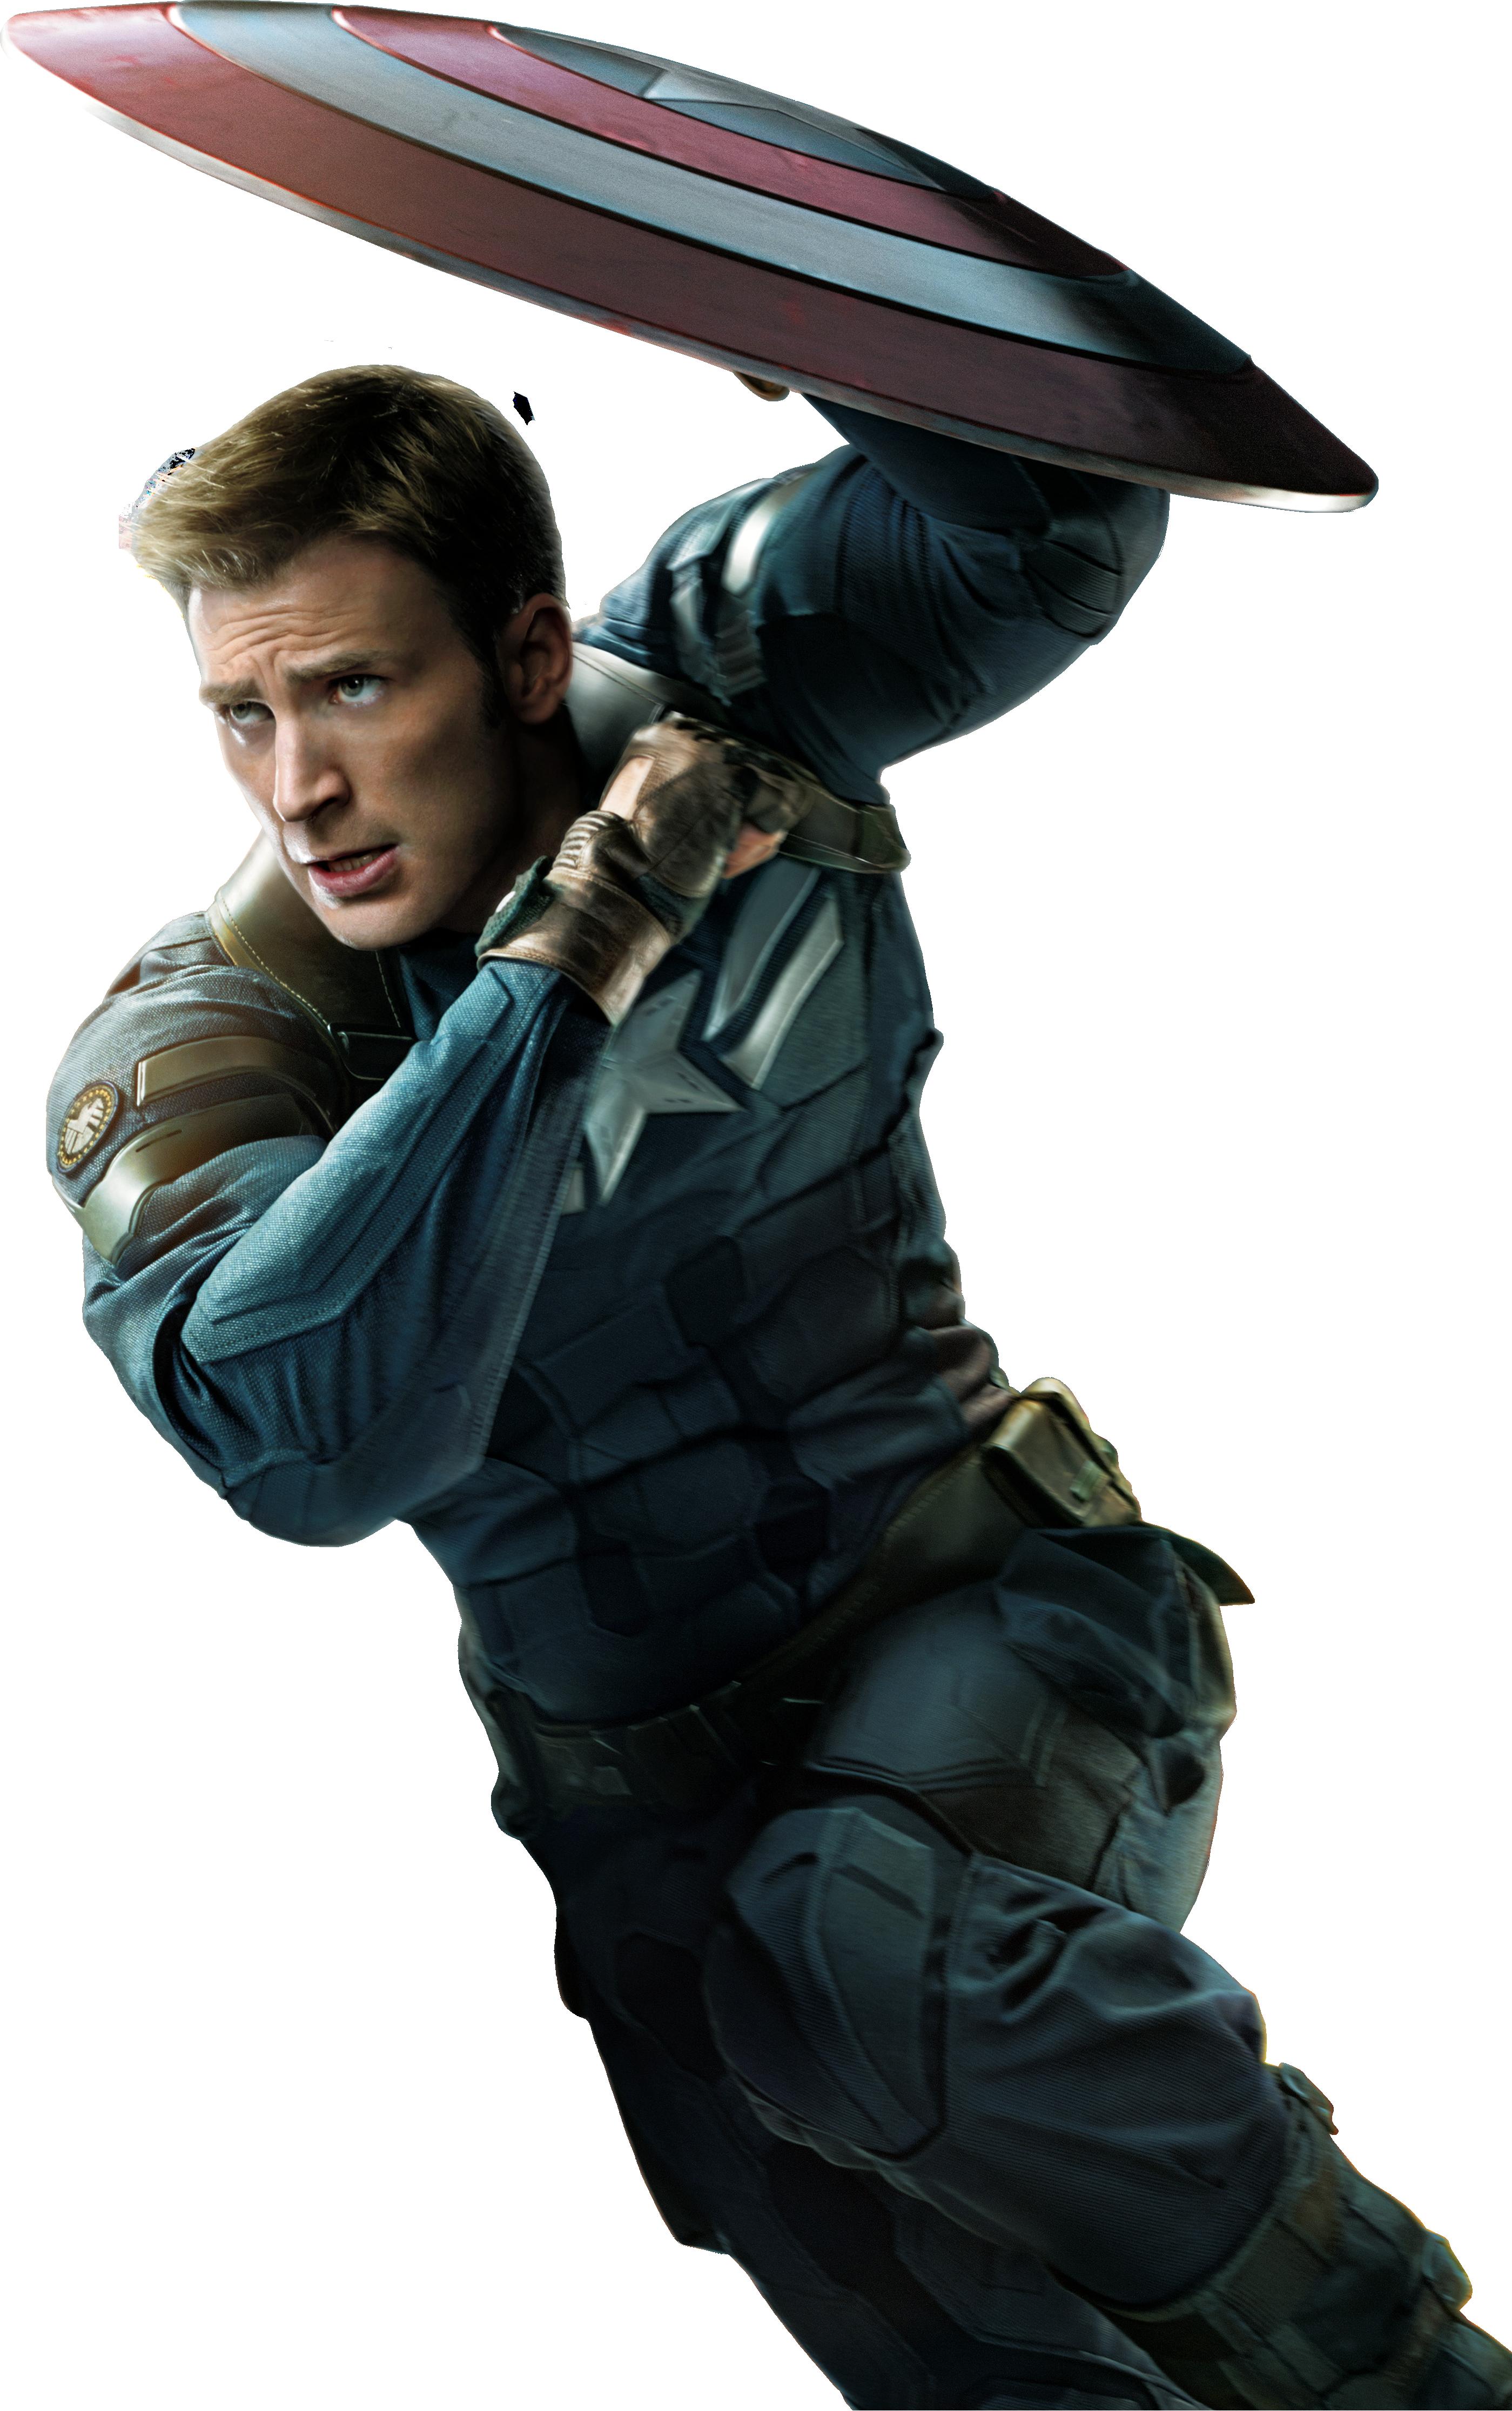 Captain America Render 2799x4463 by sachso74 on DeviantArt